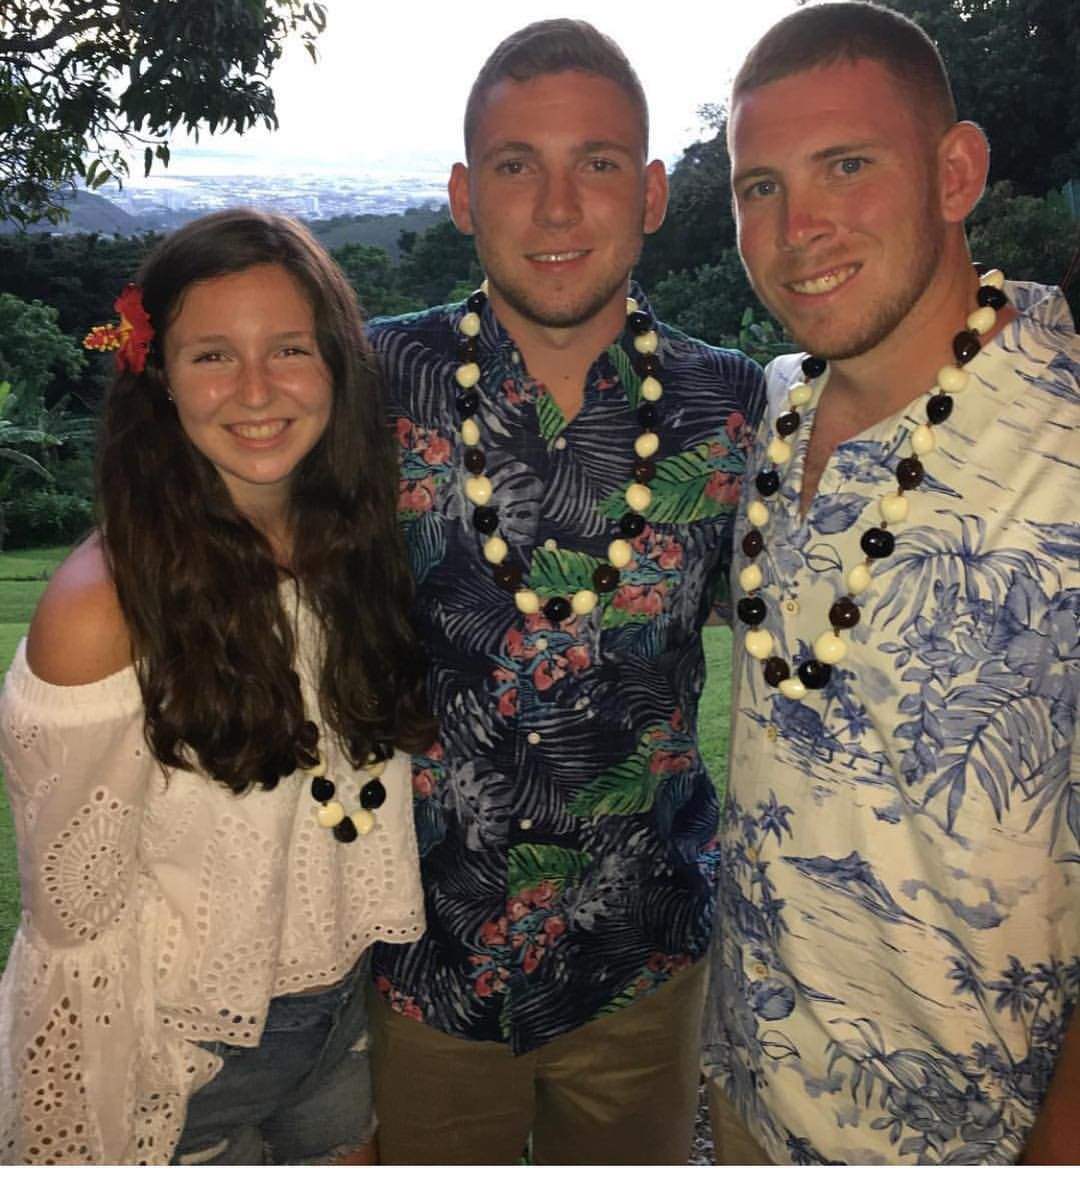 The beautiful Duffy kids in Hawaii. @emmaduff.y you look adorbs in our White Eyelet top and jean shorts. 😍😍😍 #hawaii #familyvaca #siblings #whiteeyelet #whiteeyelettop #jeanshorts #ootd #ootdfashion #lookswelove #islandtime #onislandtime